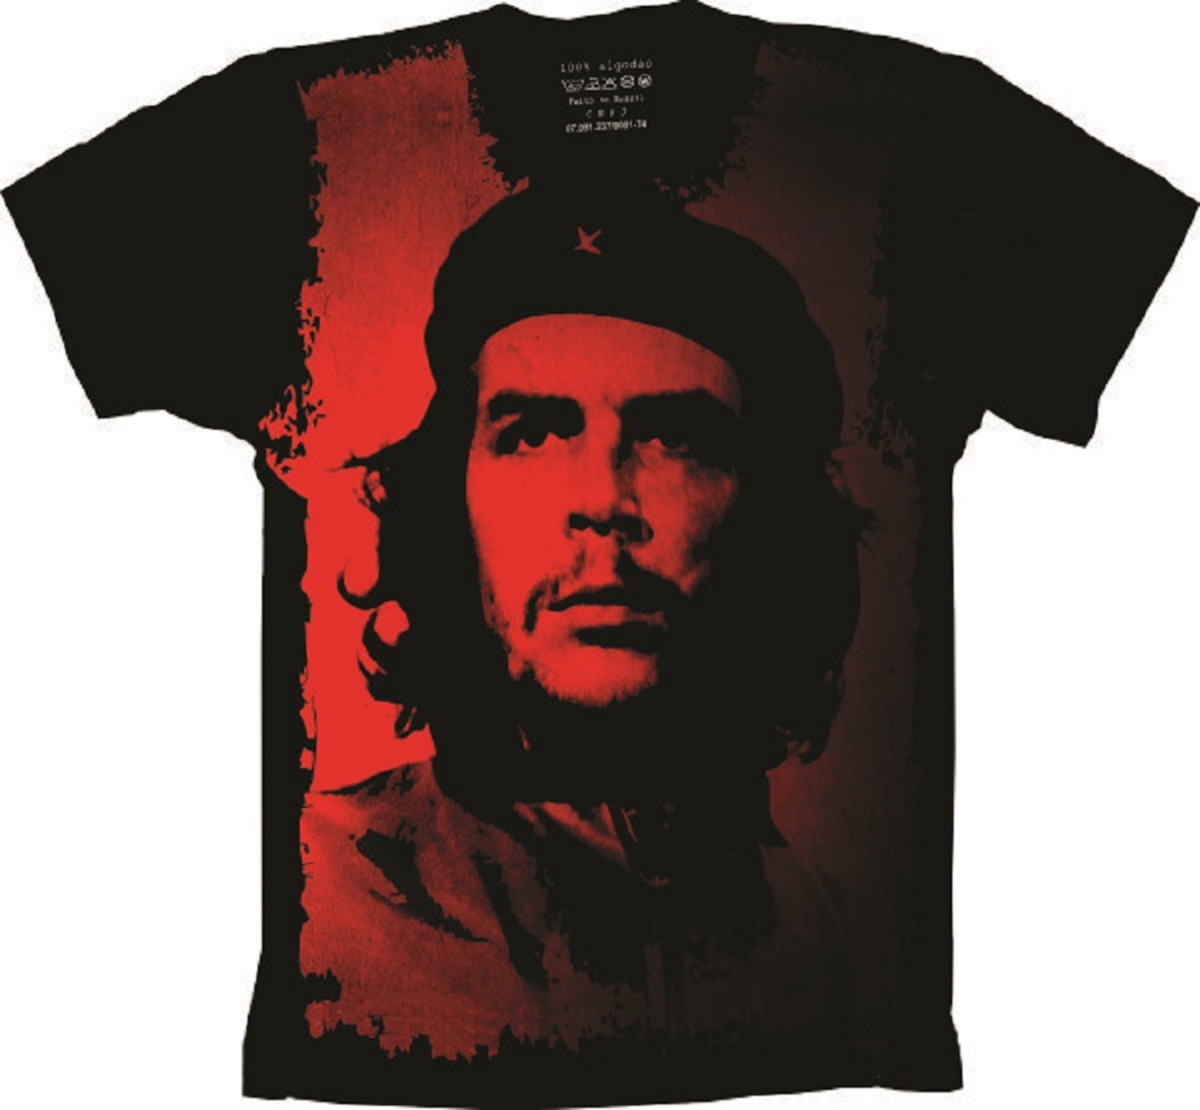 b3c77e5cd5 Camiseta Che Guevara - Socialismo no Elo7